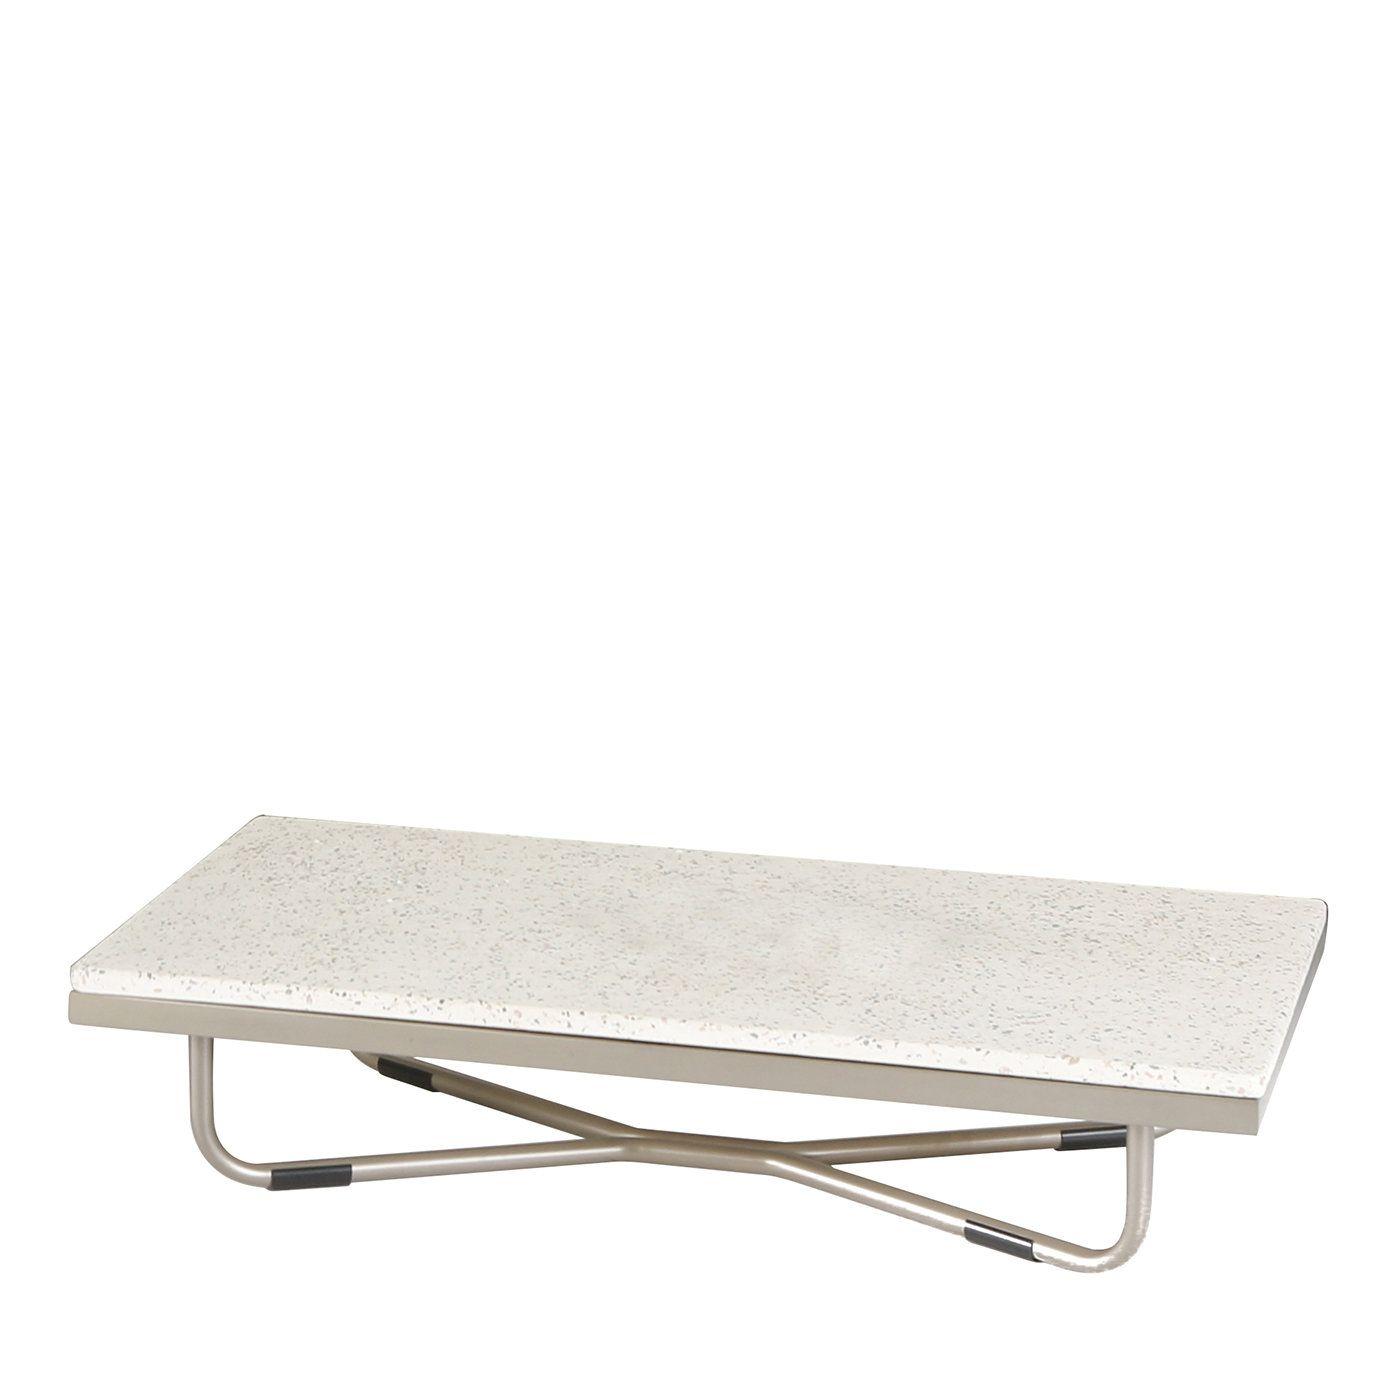 Forte Dei Marmi Coffee Table Coffee Table Grey Marble Marble Top [ 1400 x 1400 Pixel ]